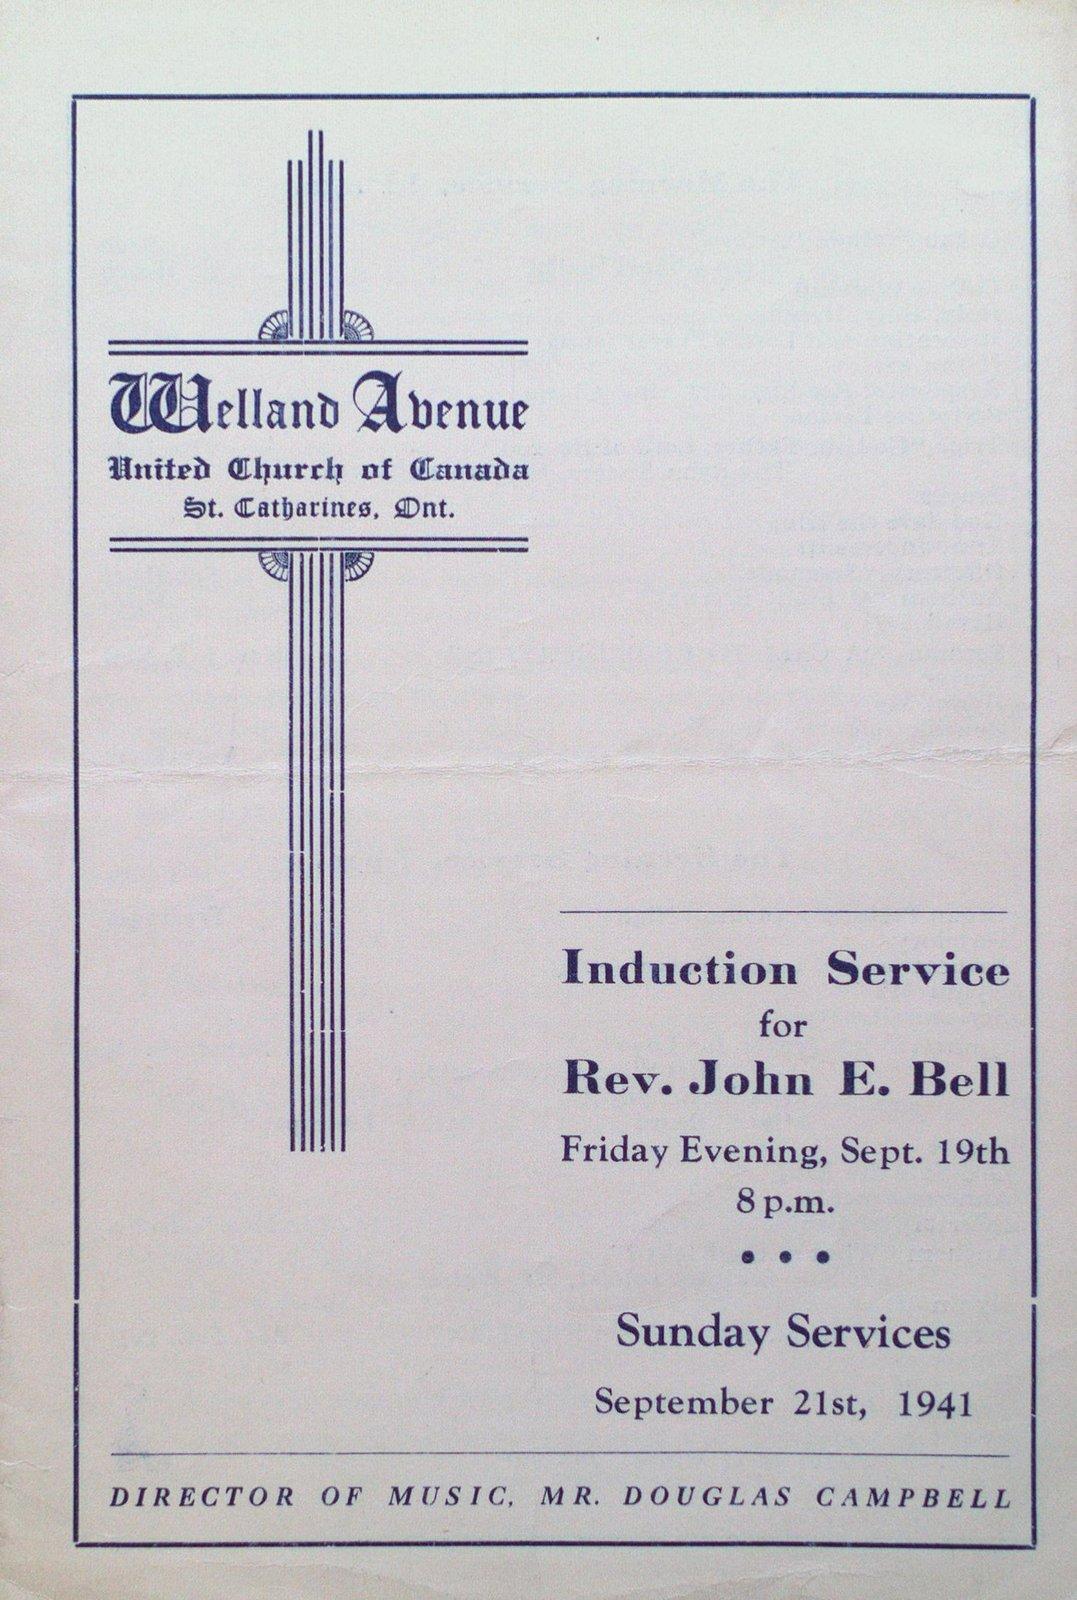 Induction Service for Reverend John E. Bell